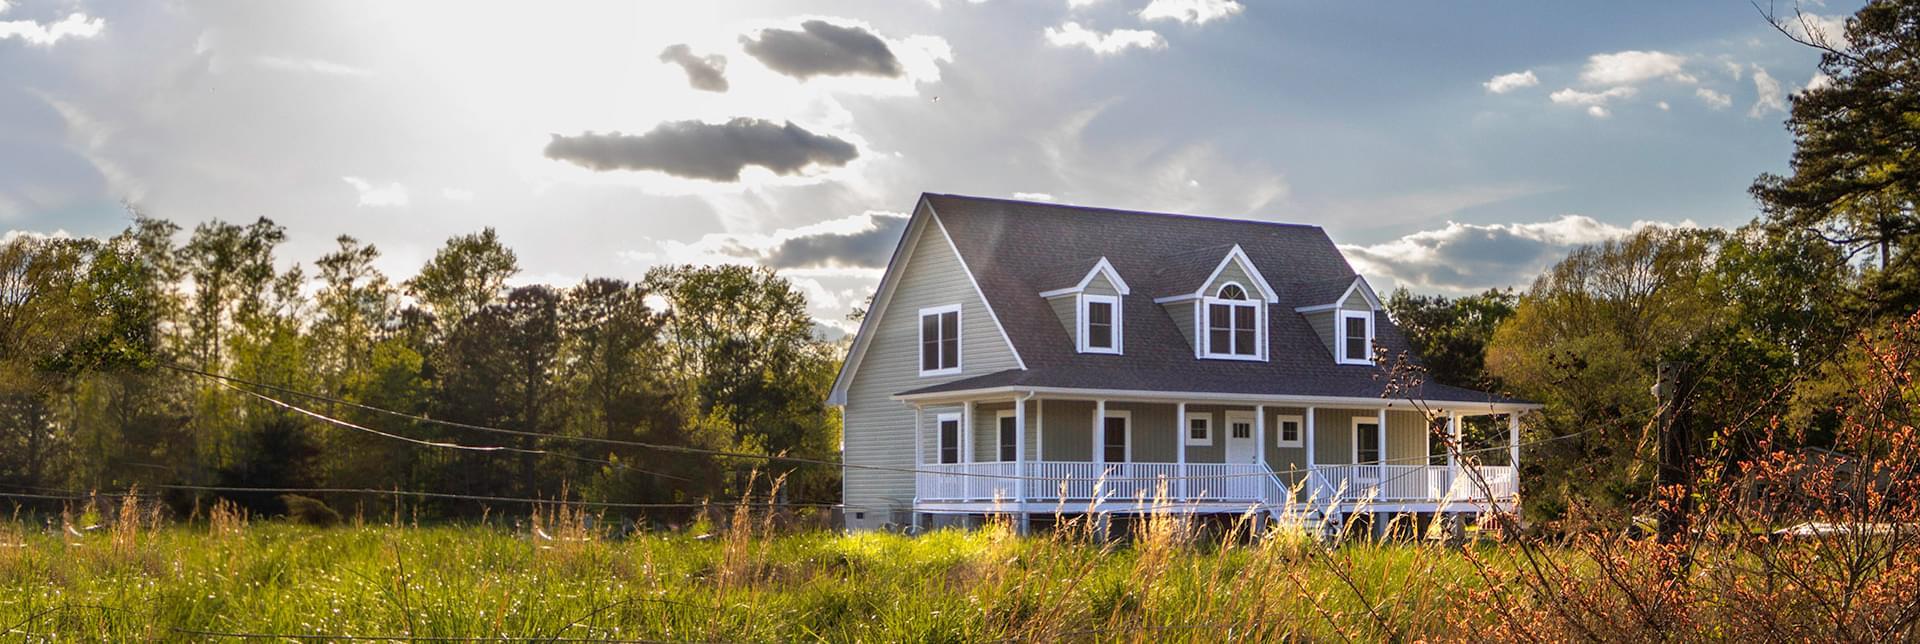 New Homes in Powhatan County VA